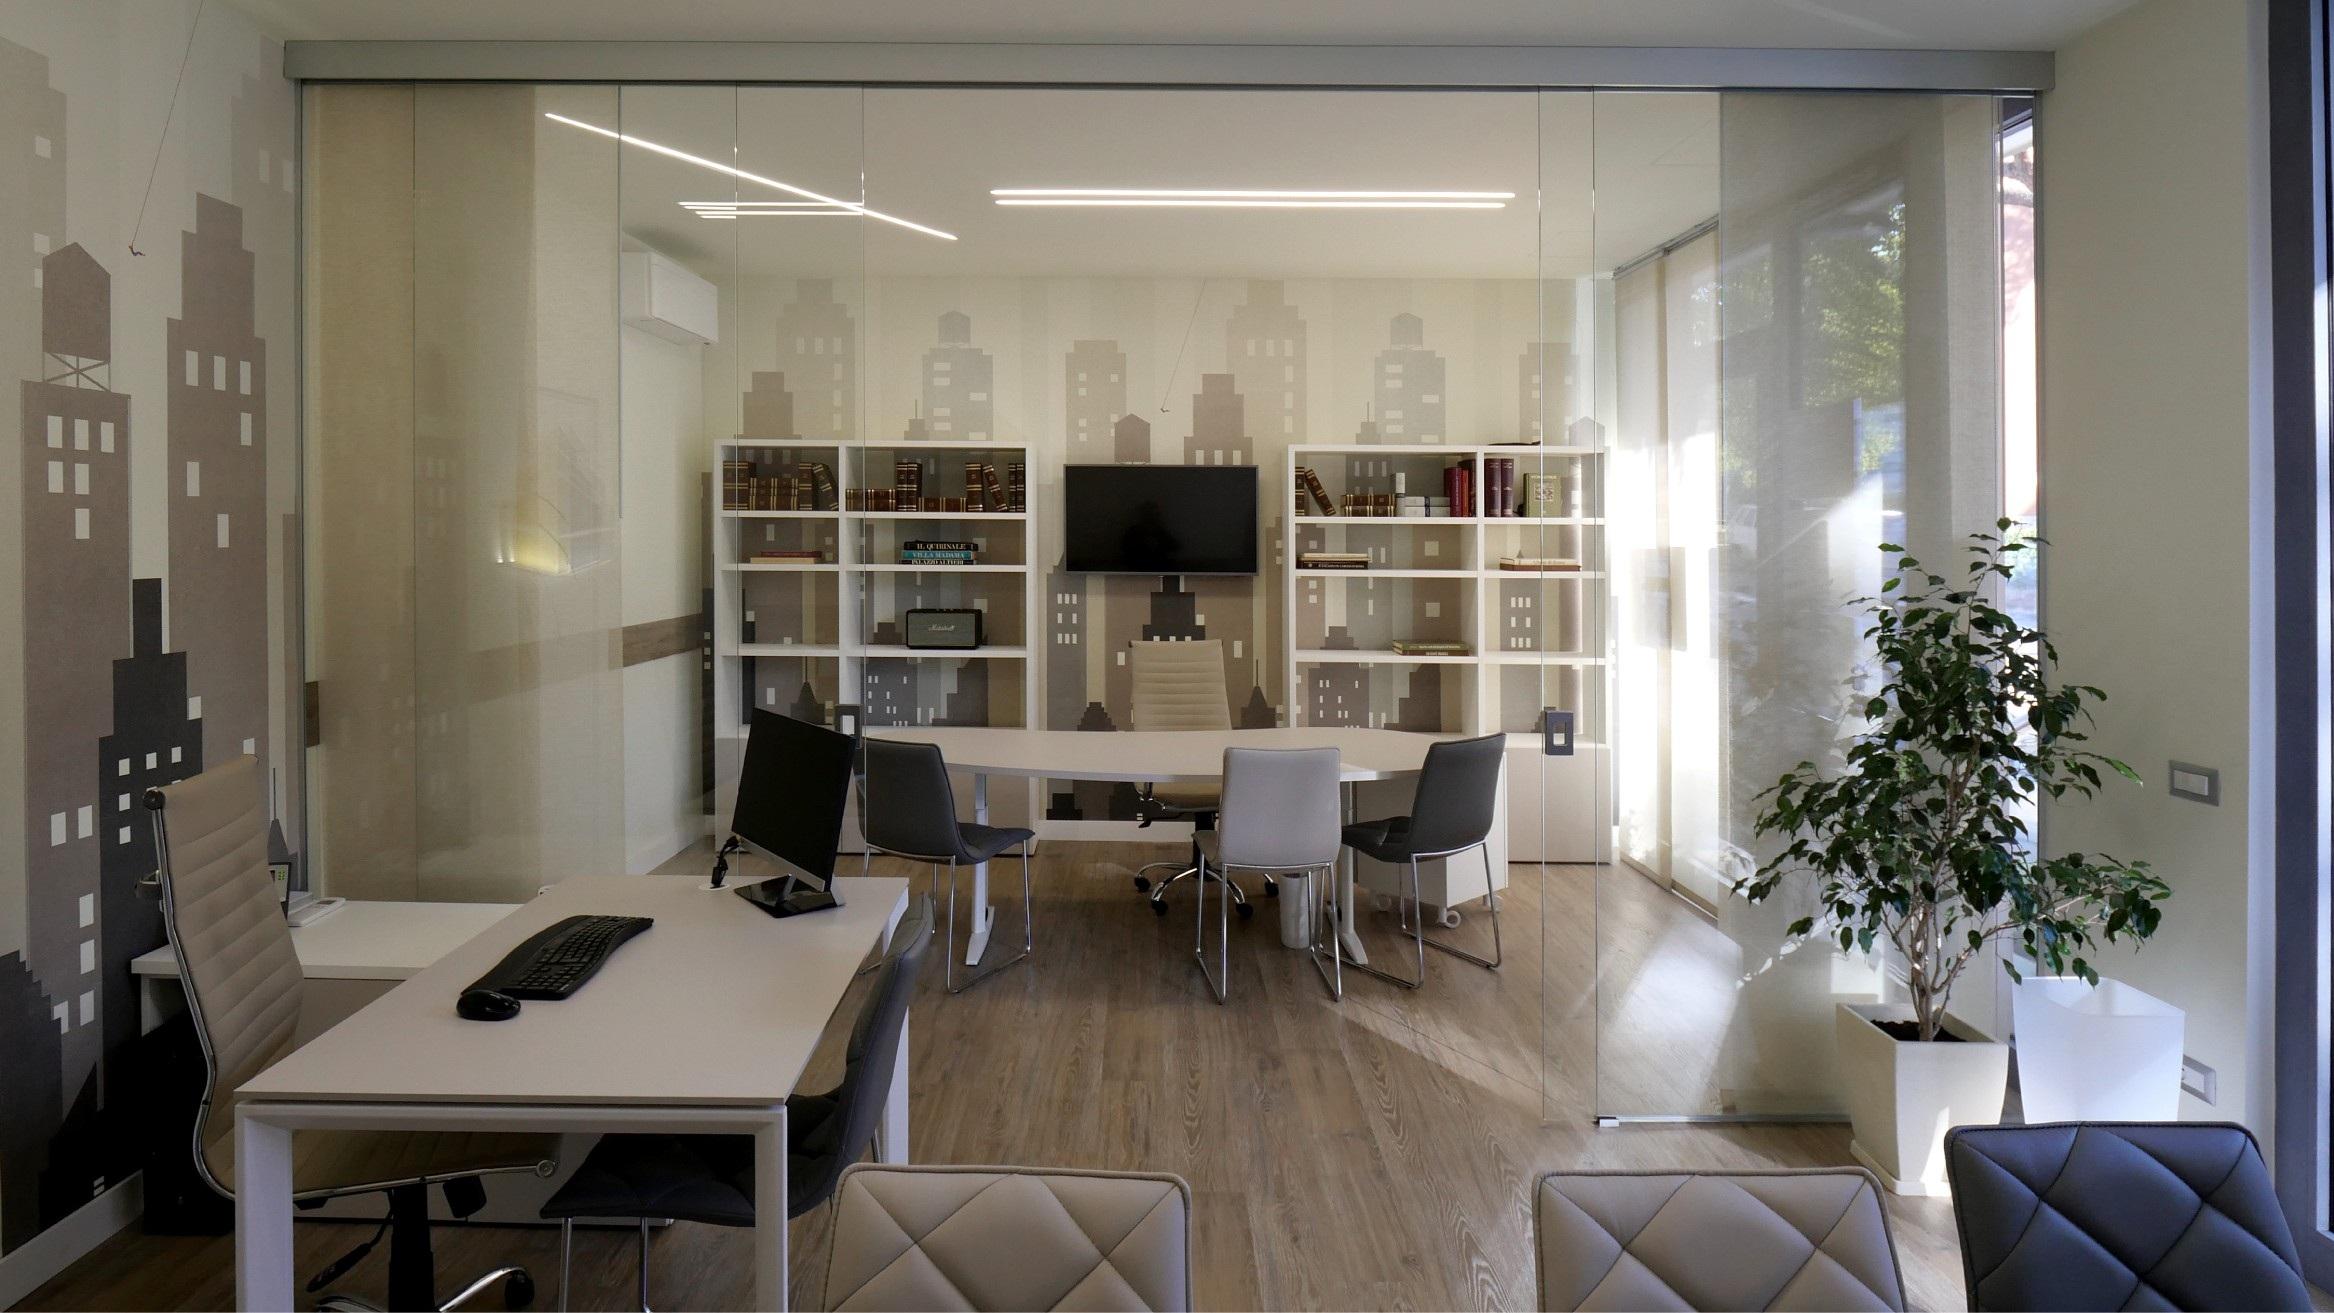 REAL ESTATE STUDIO - Rome, Italy -